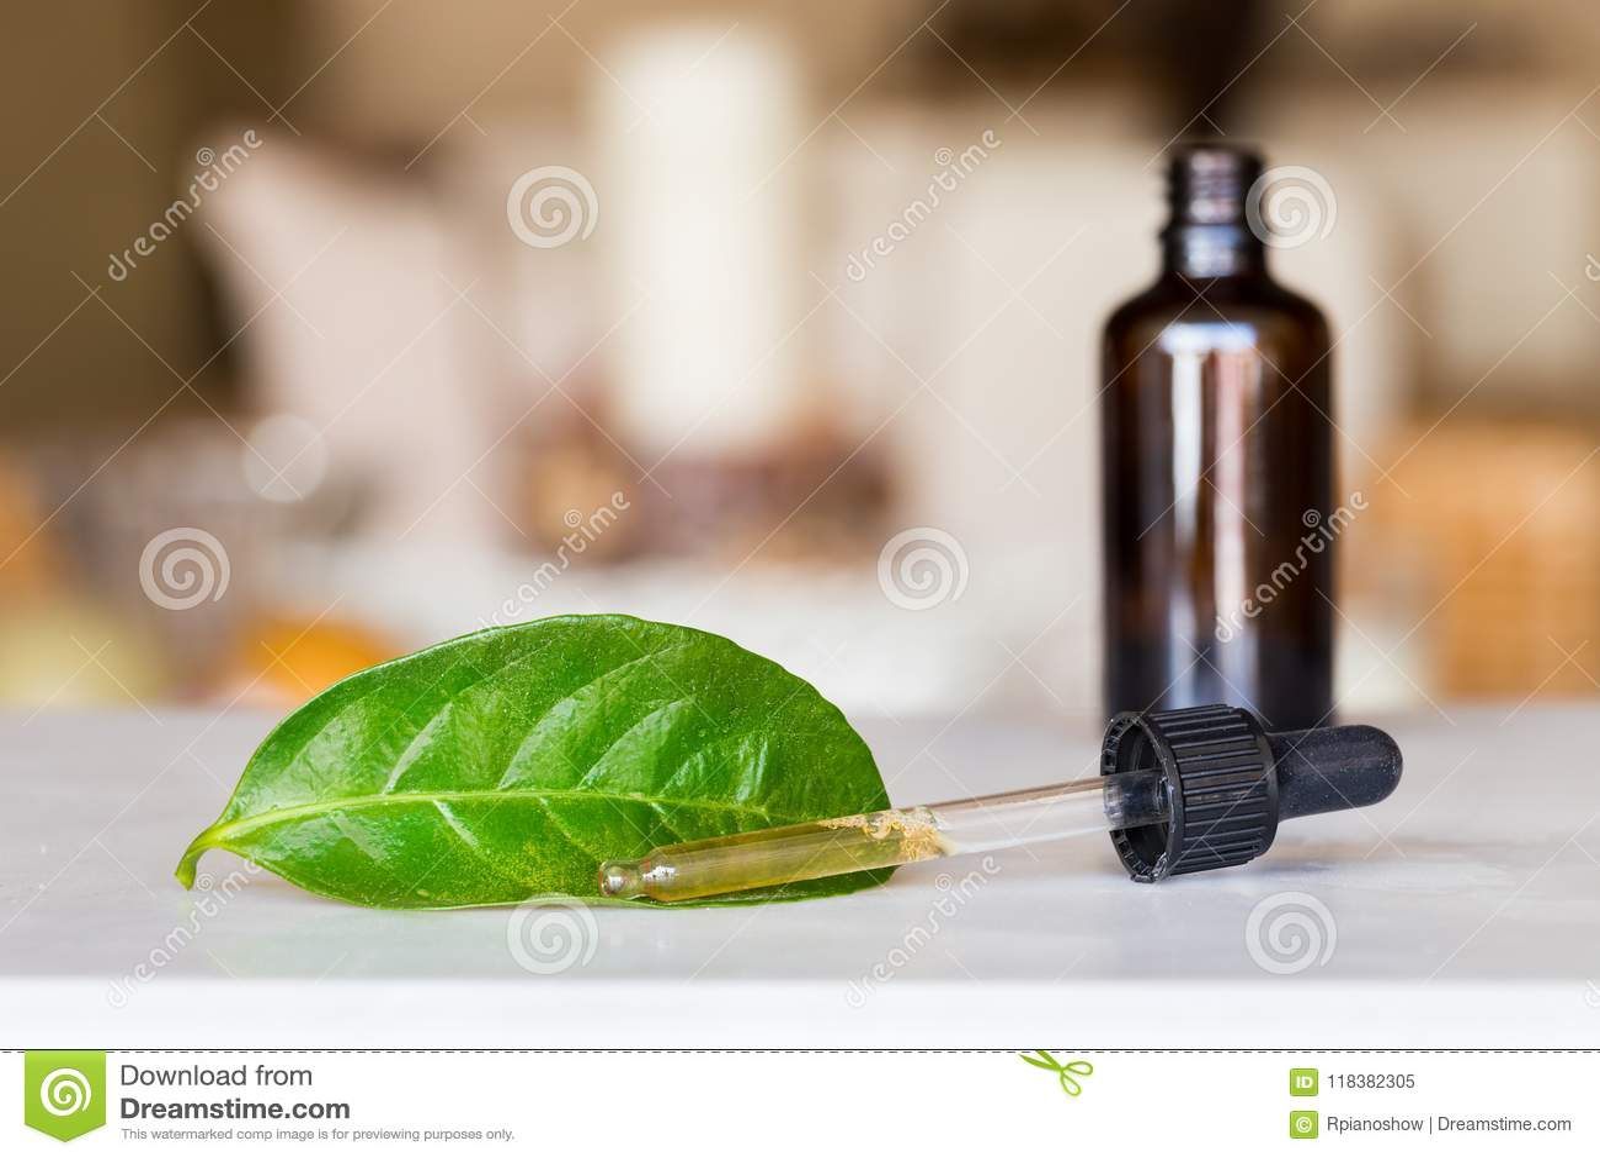 Dropper με το υγρό με ένα μπουκάλι και ένα πράσινο φύλλο